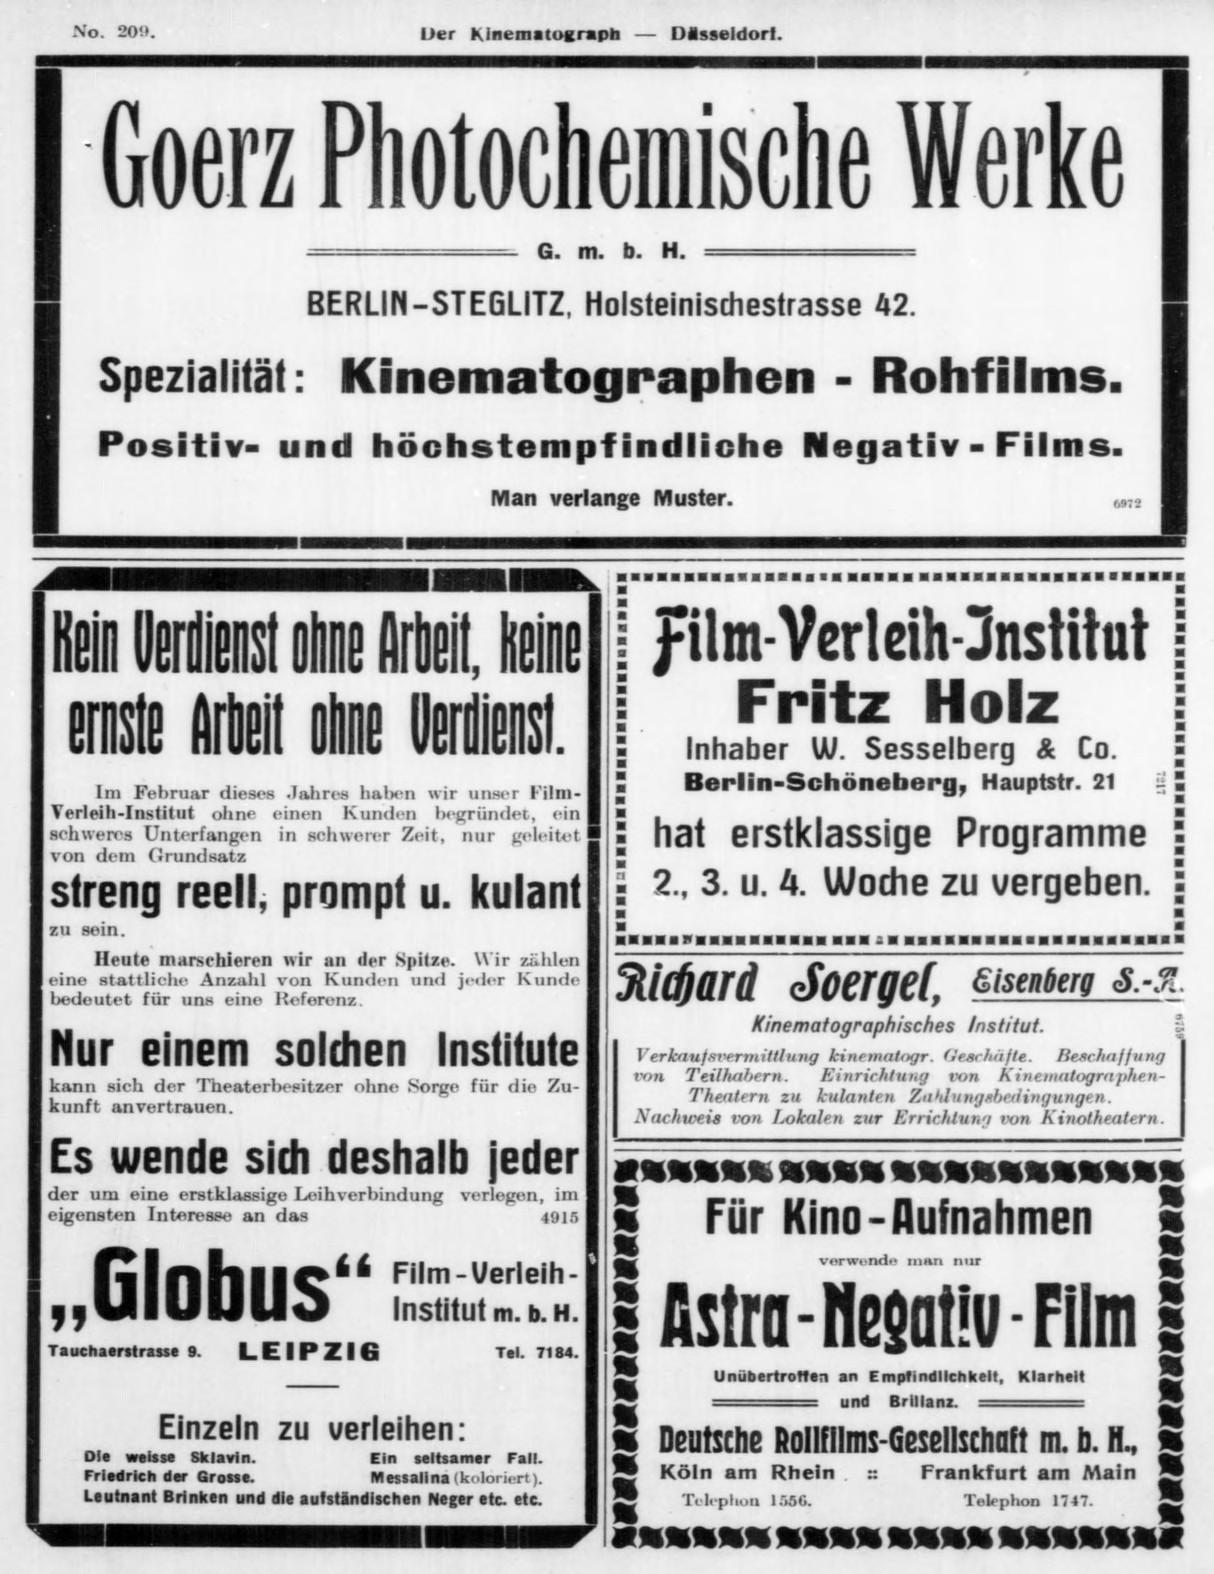 Kinematograph04-1910-12_jp2.zip&file=kinematograph04-1910-12_jp2%2fkinematograph04-1910-12_0103